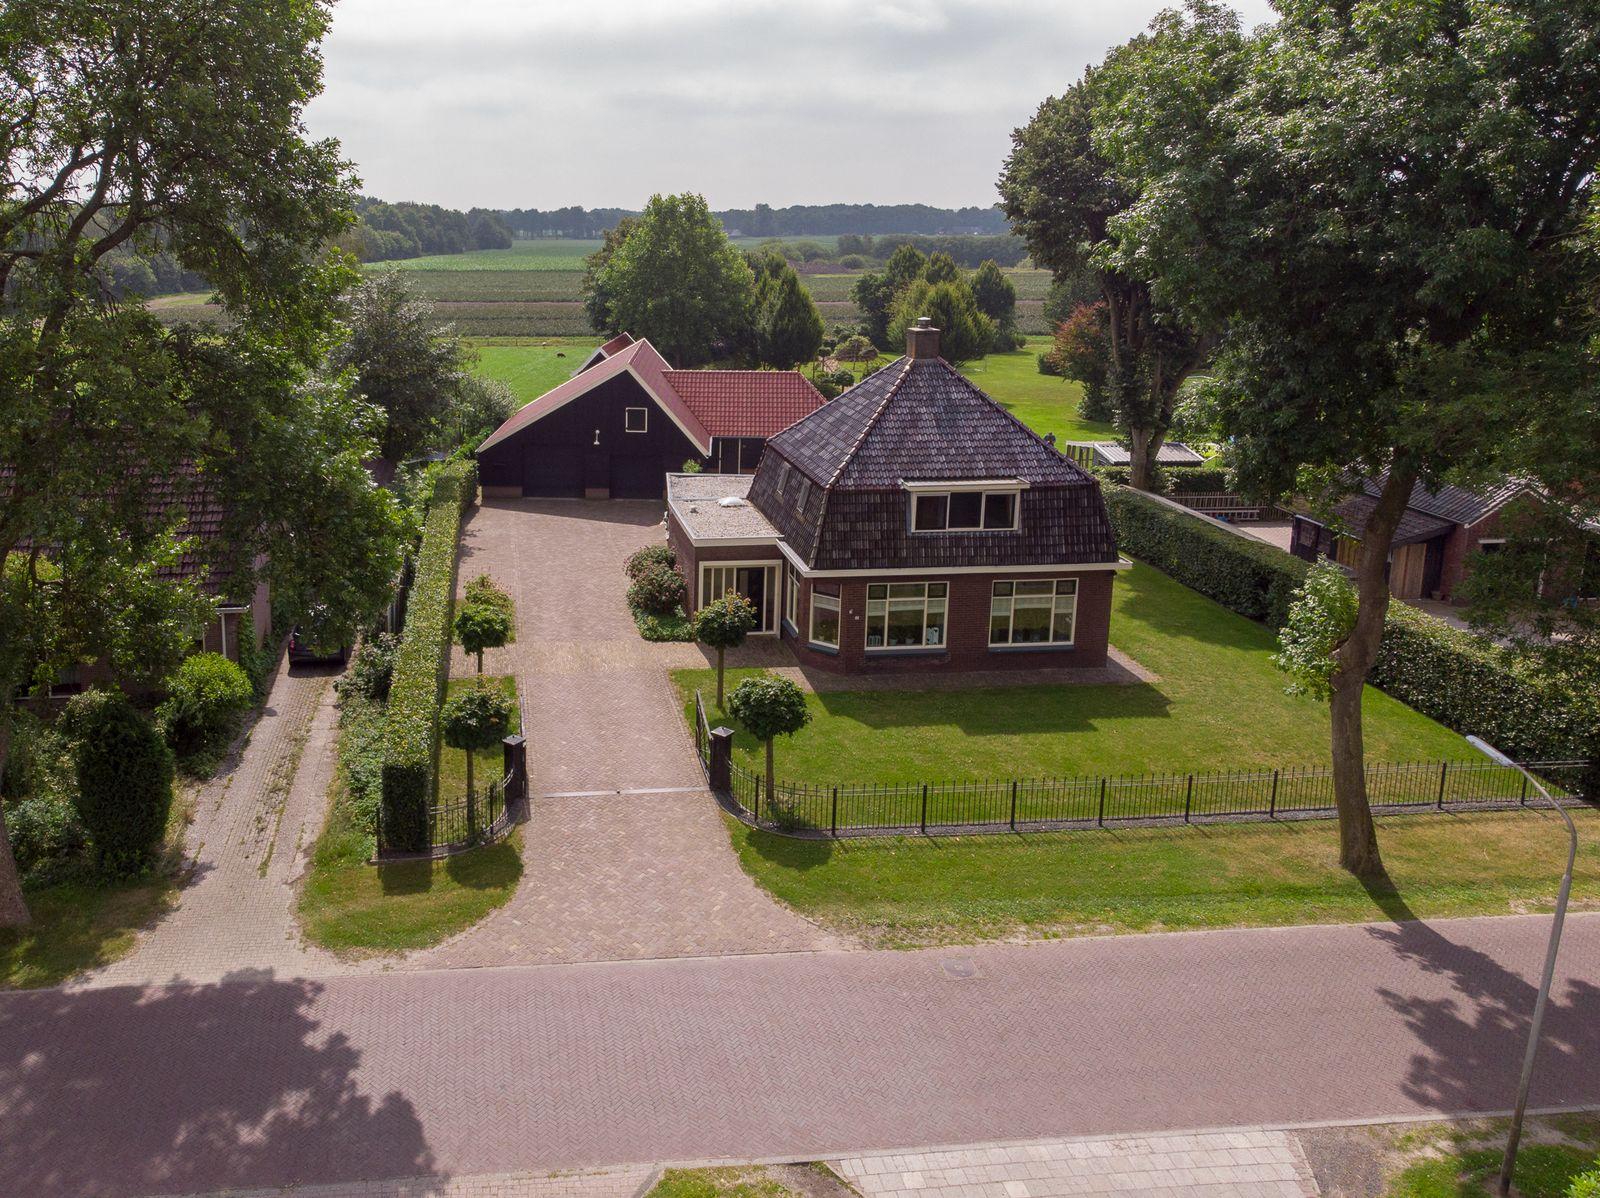 Leggelerstraat 5, Dwingeloo